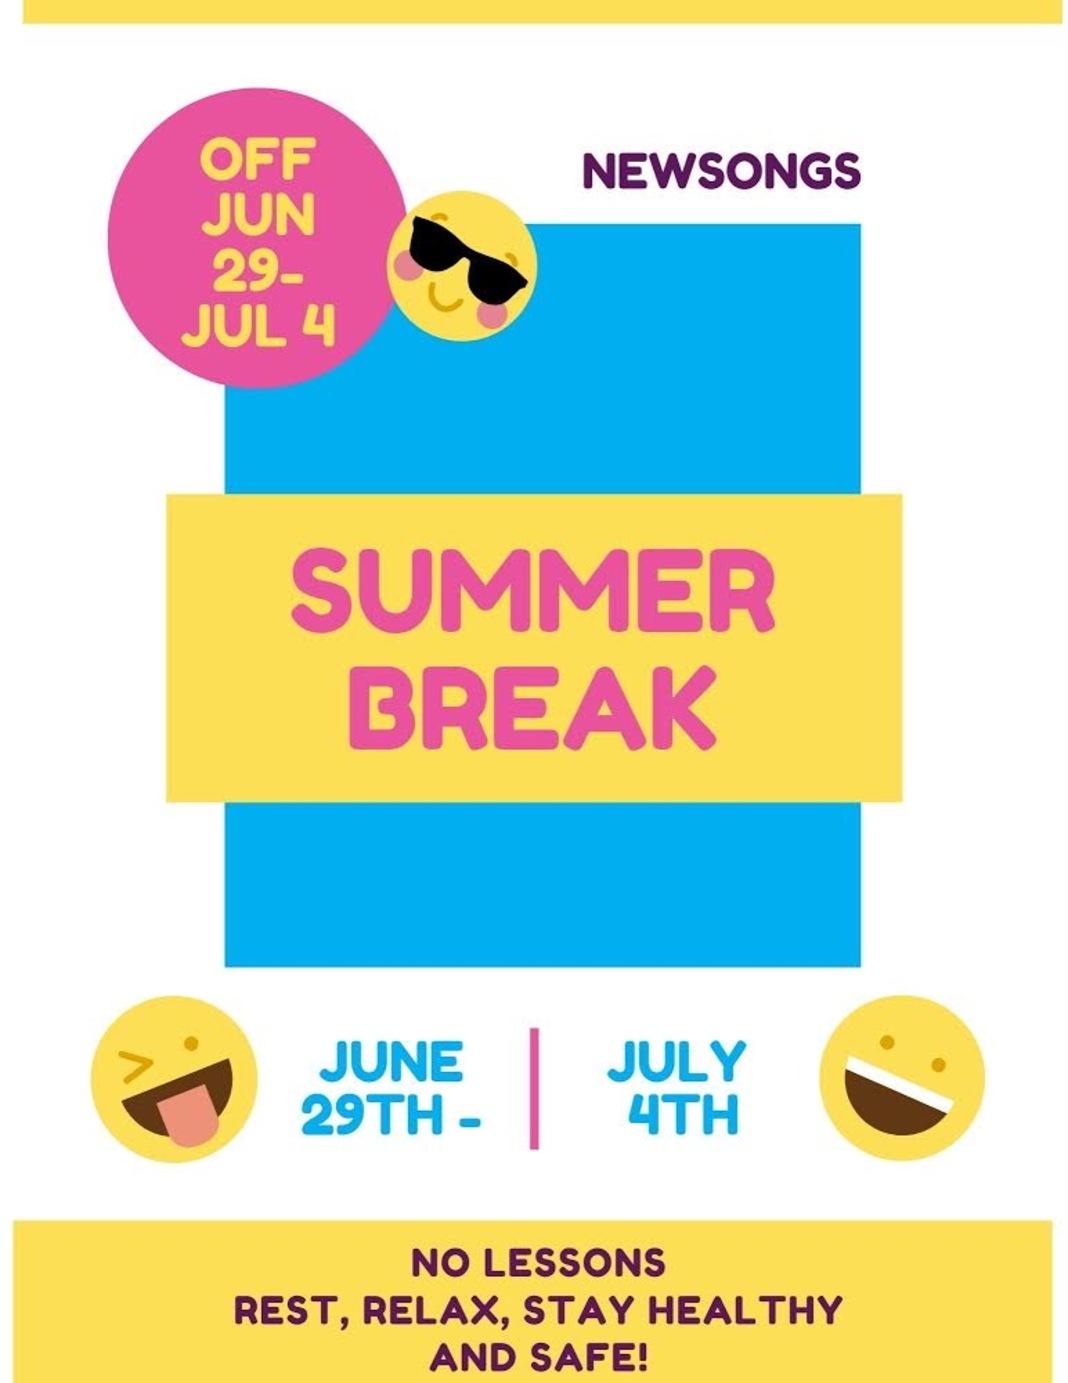 Enjoy Summer Break from Music Lessons🎹 Image